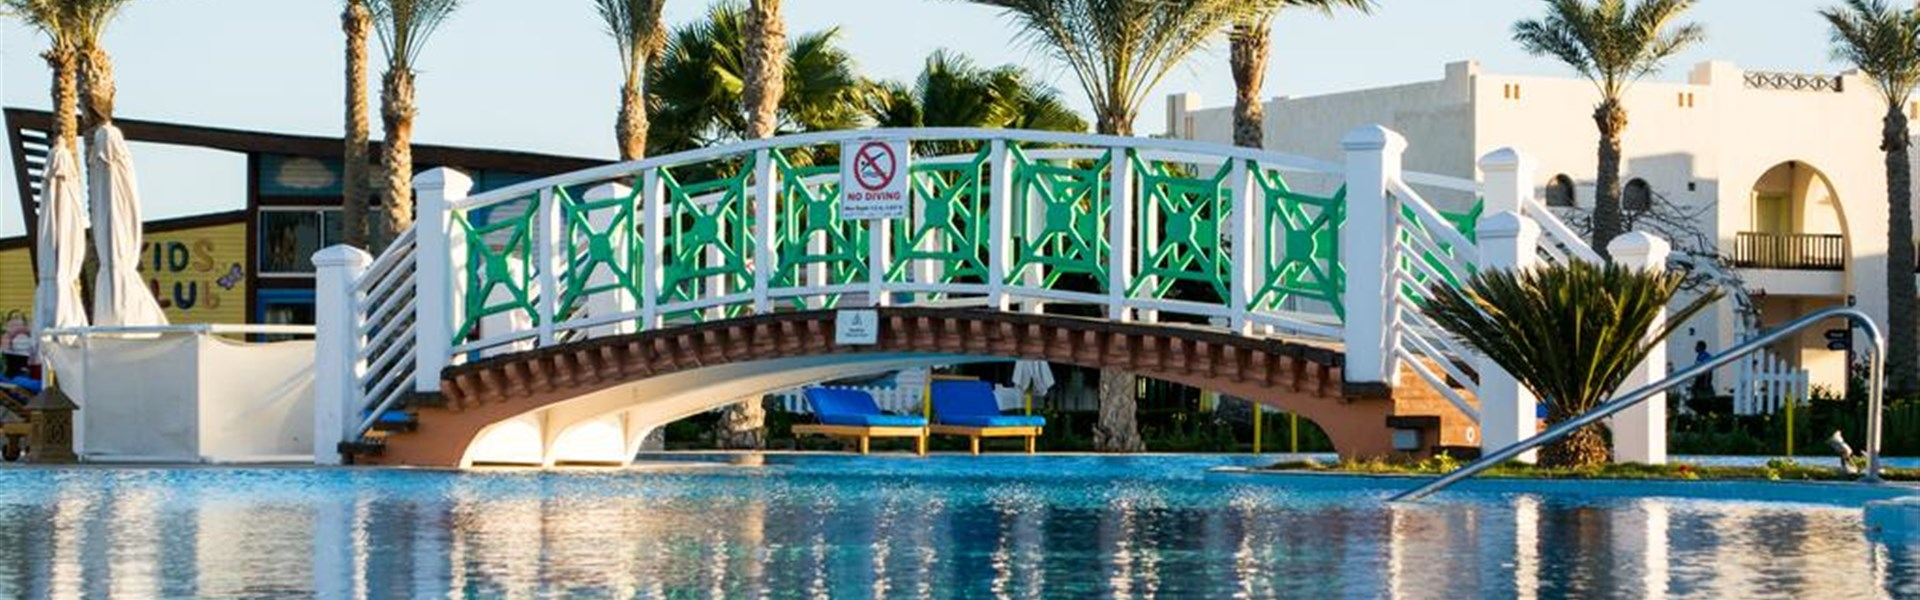 Hilton Marsa Alam Nubian Rasort (4* plus) -